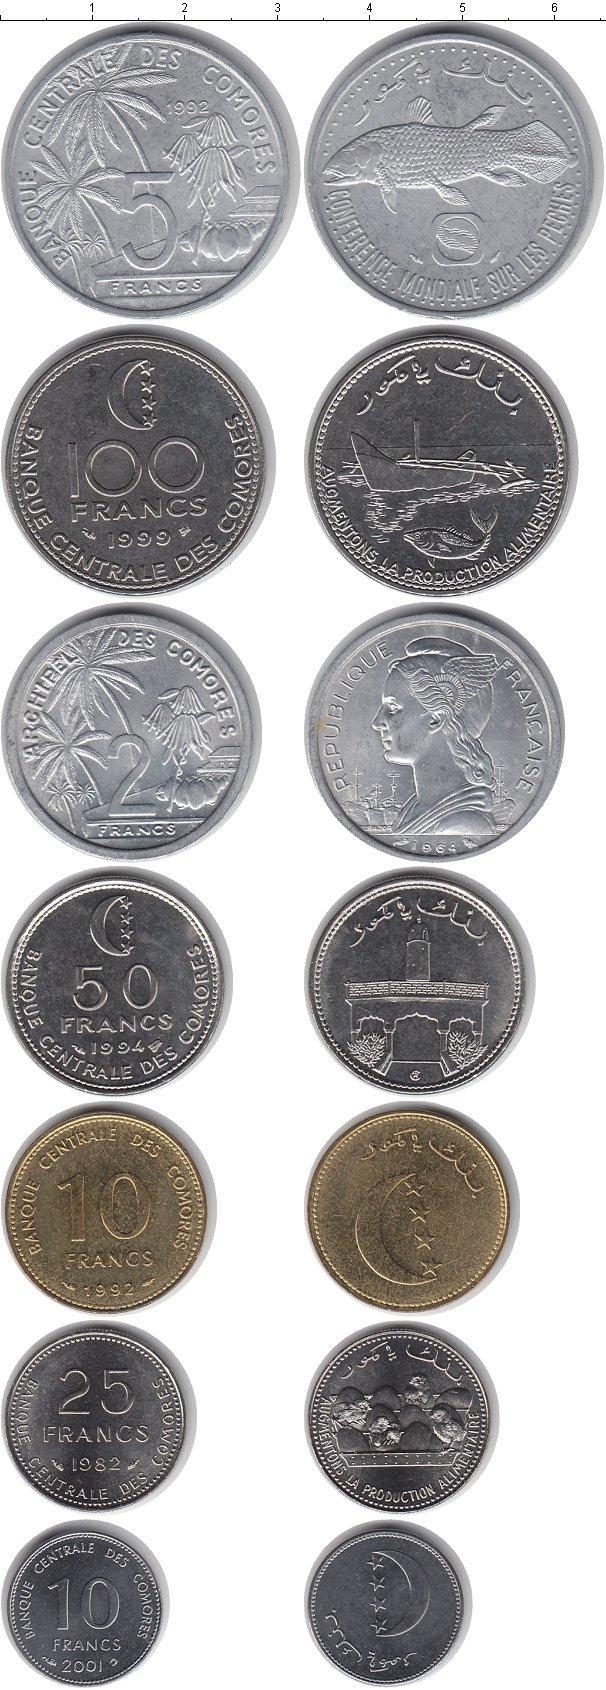 Каталог монет - Коморские острова Коморские острова 1982-2001